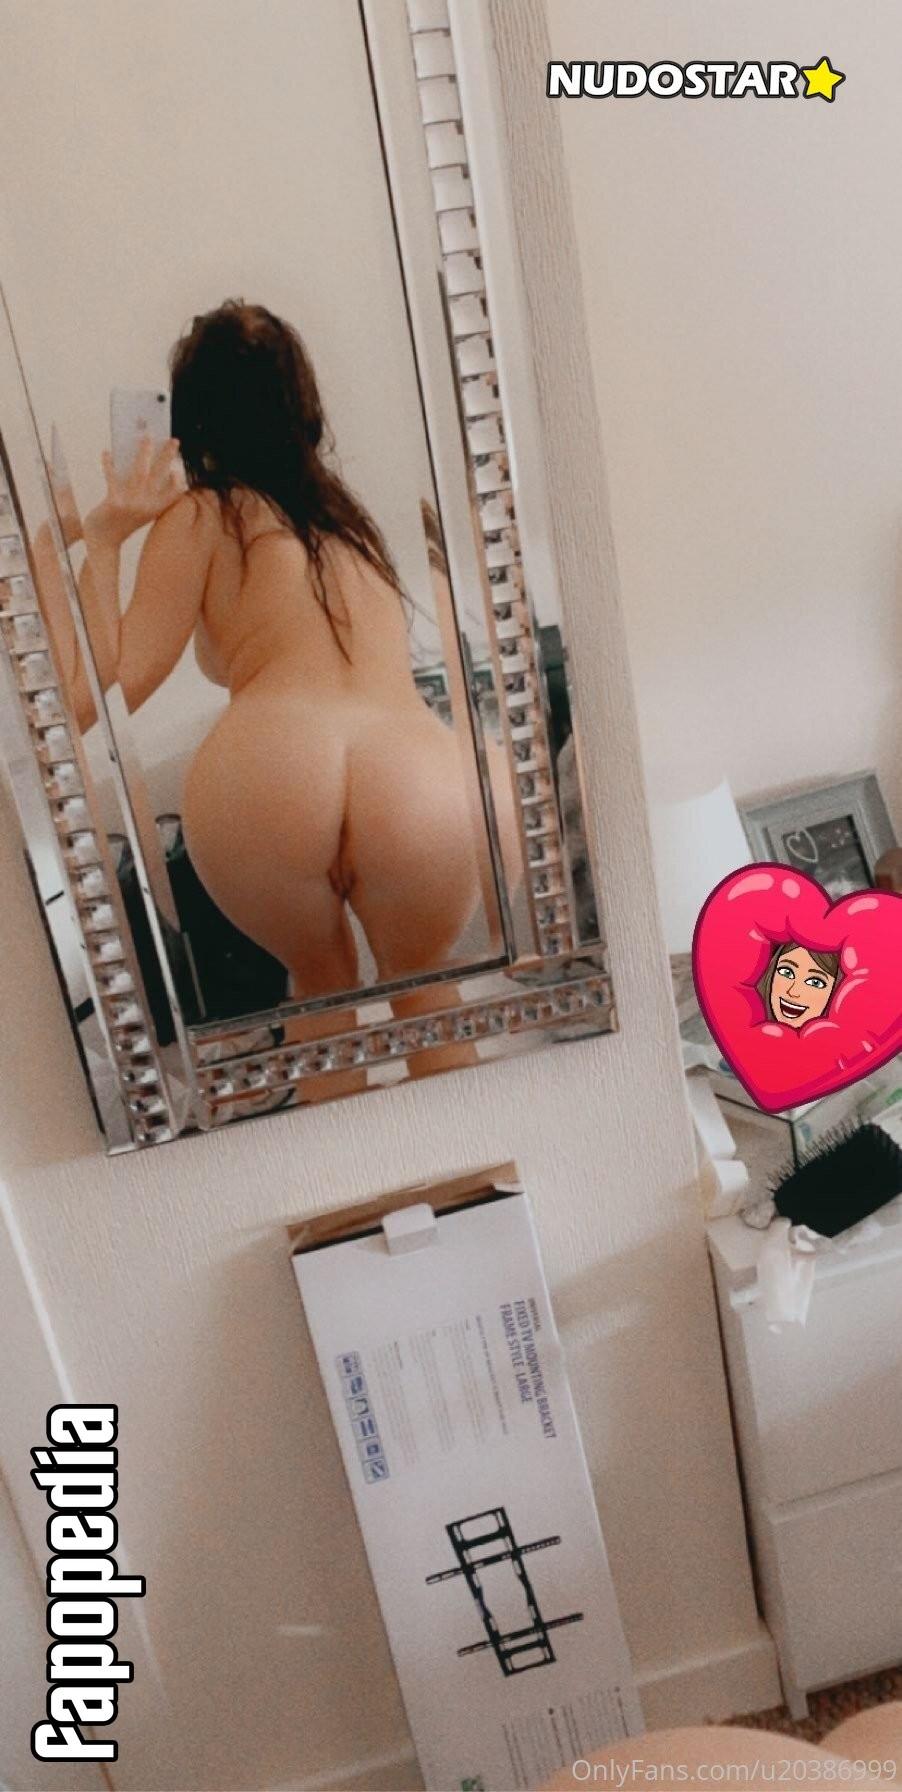 Liibbymcbride Nude OnlyFans Leaks